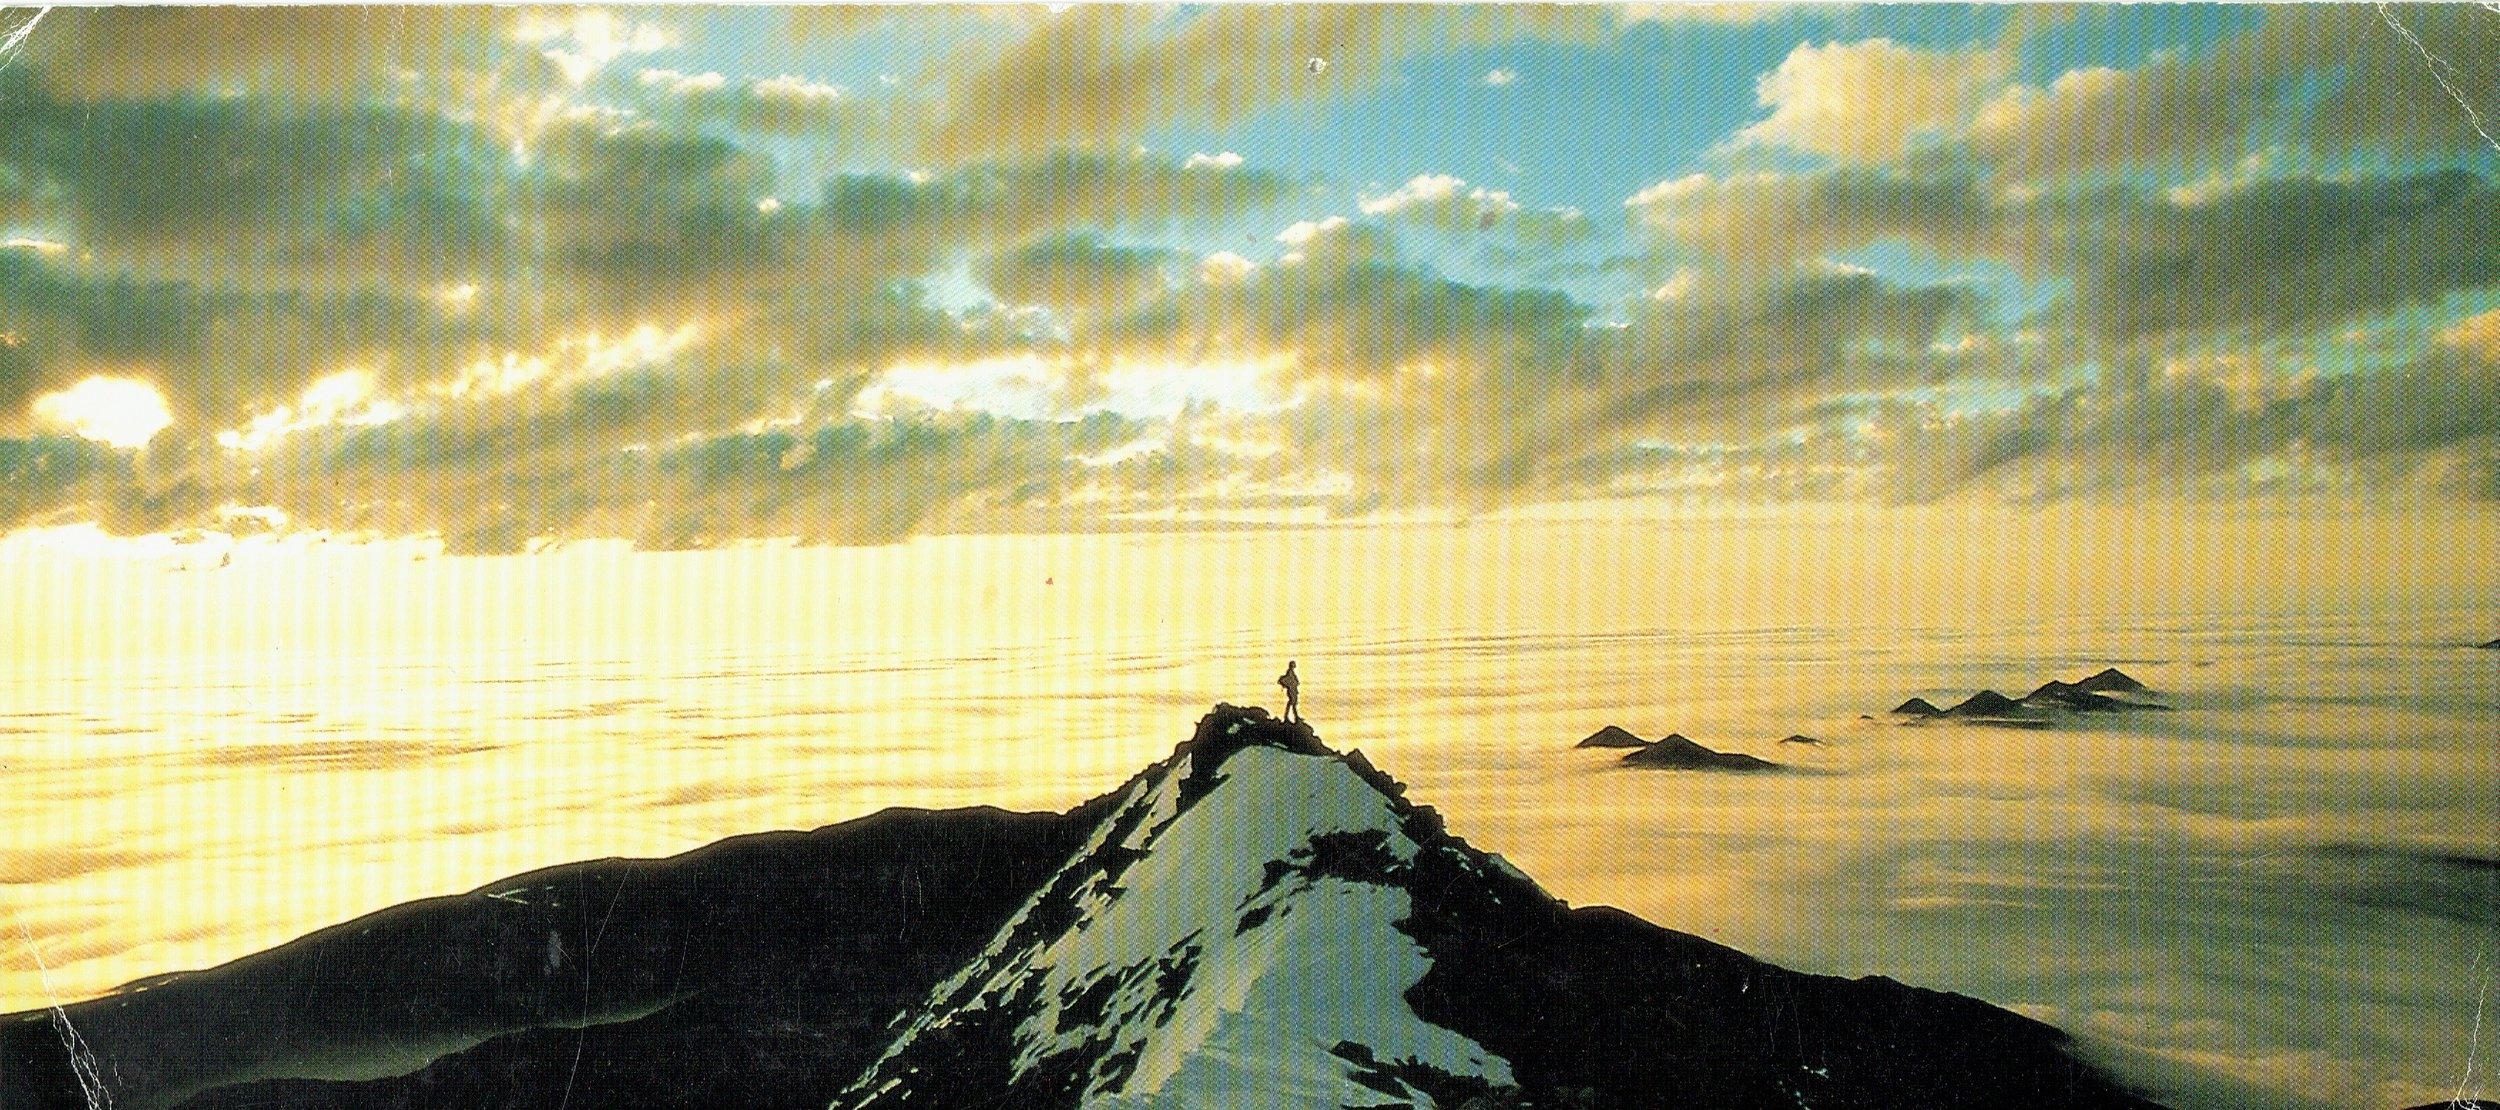 Postcard on my desk - copyright: C.H. Smith/P. Arnold/Bios